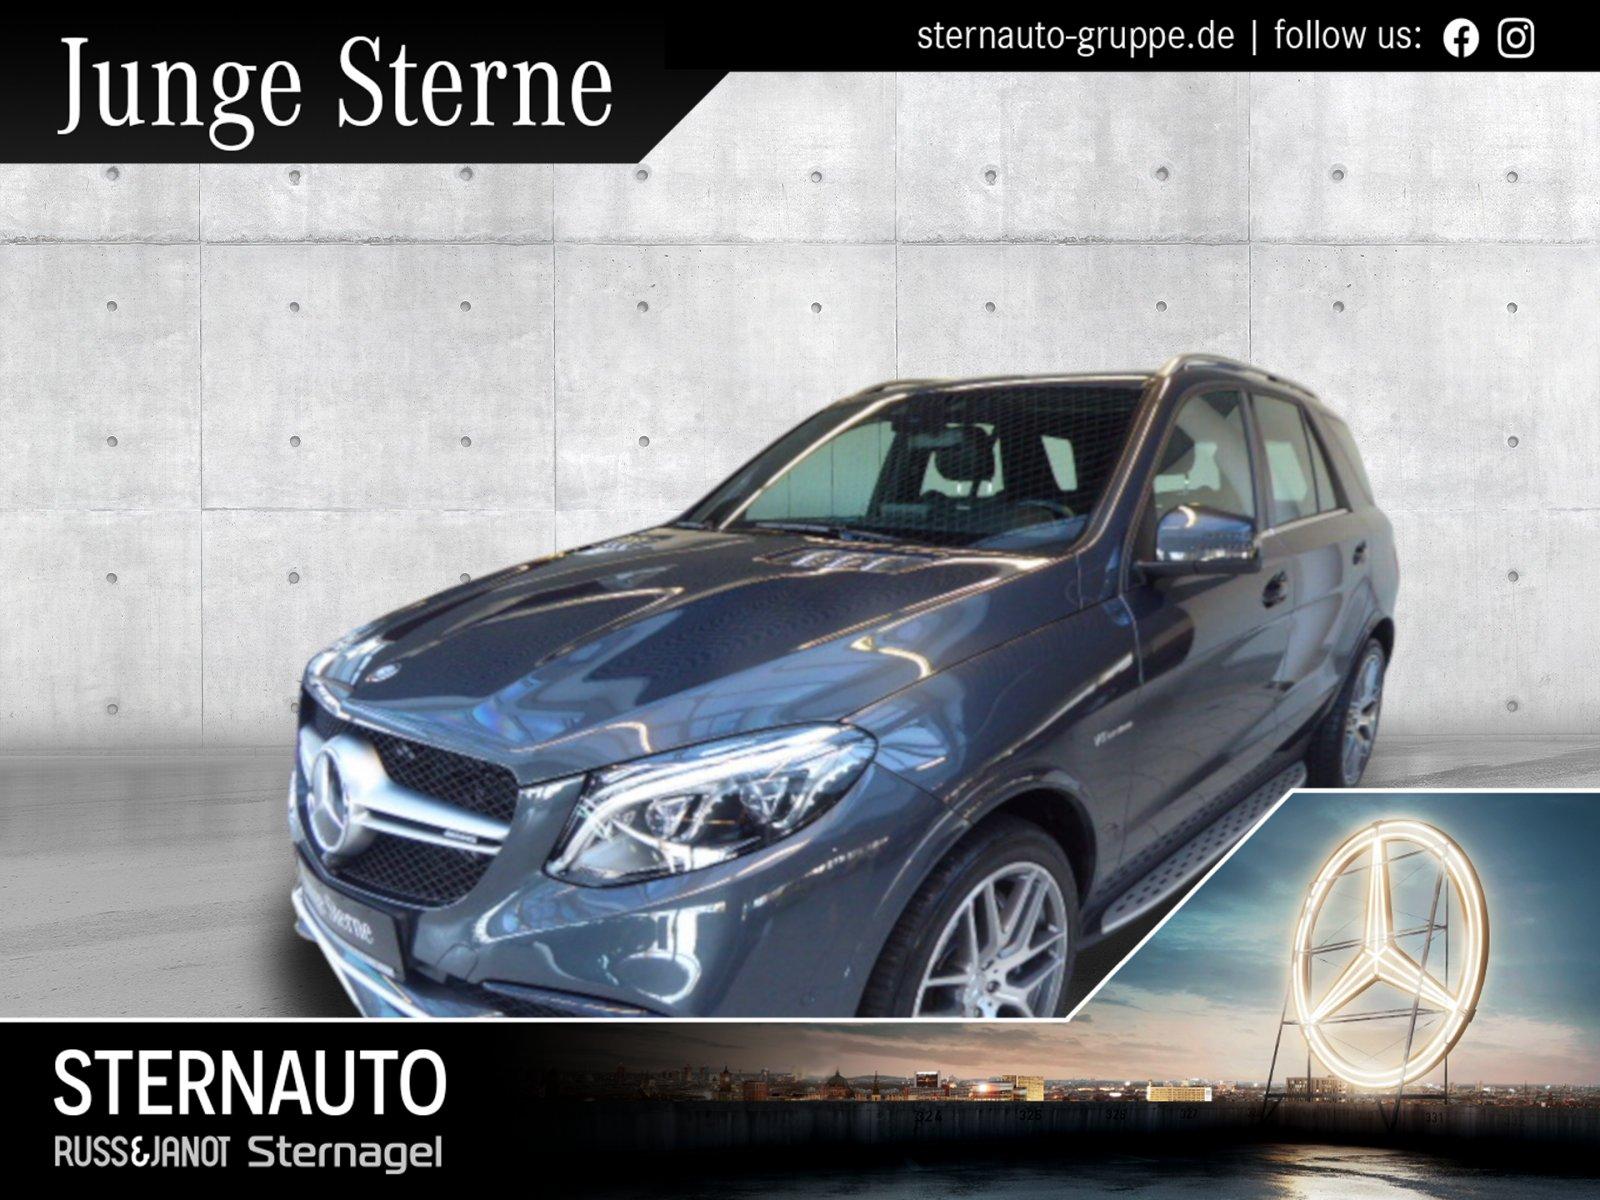 Mercedes-Benz GLE 63 AMG 4M COMAND/Distronic/AIRMATIC/LED/AHK, Jahr 2016, Benzin